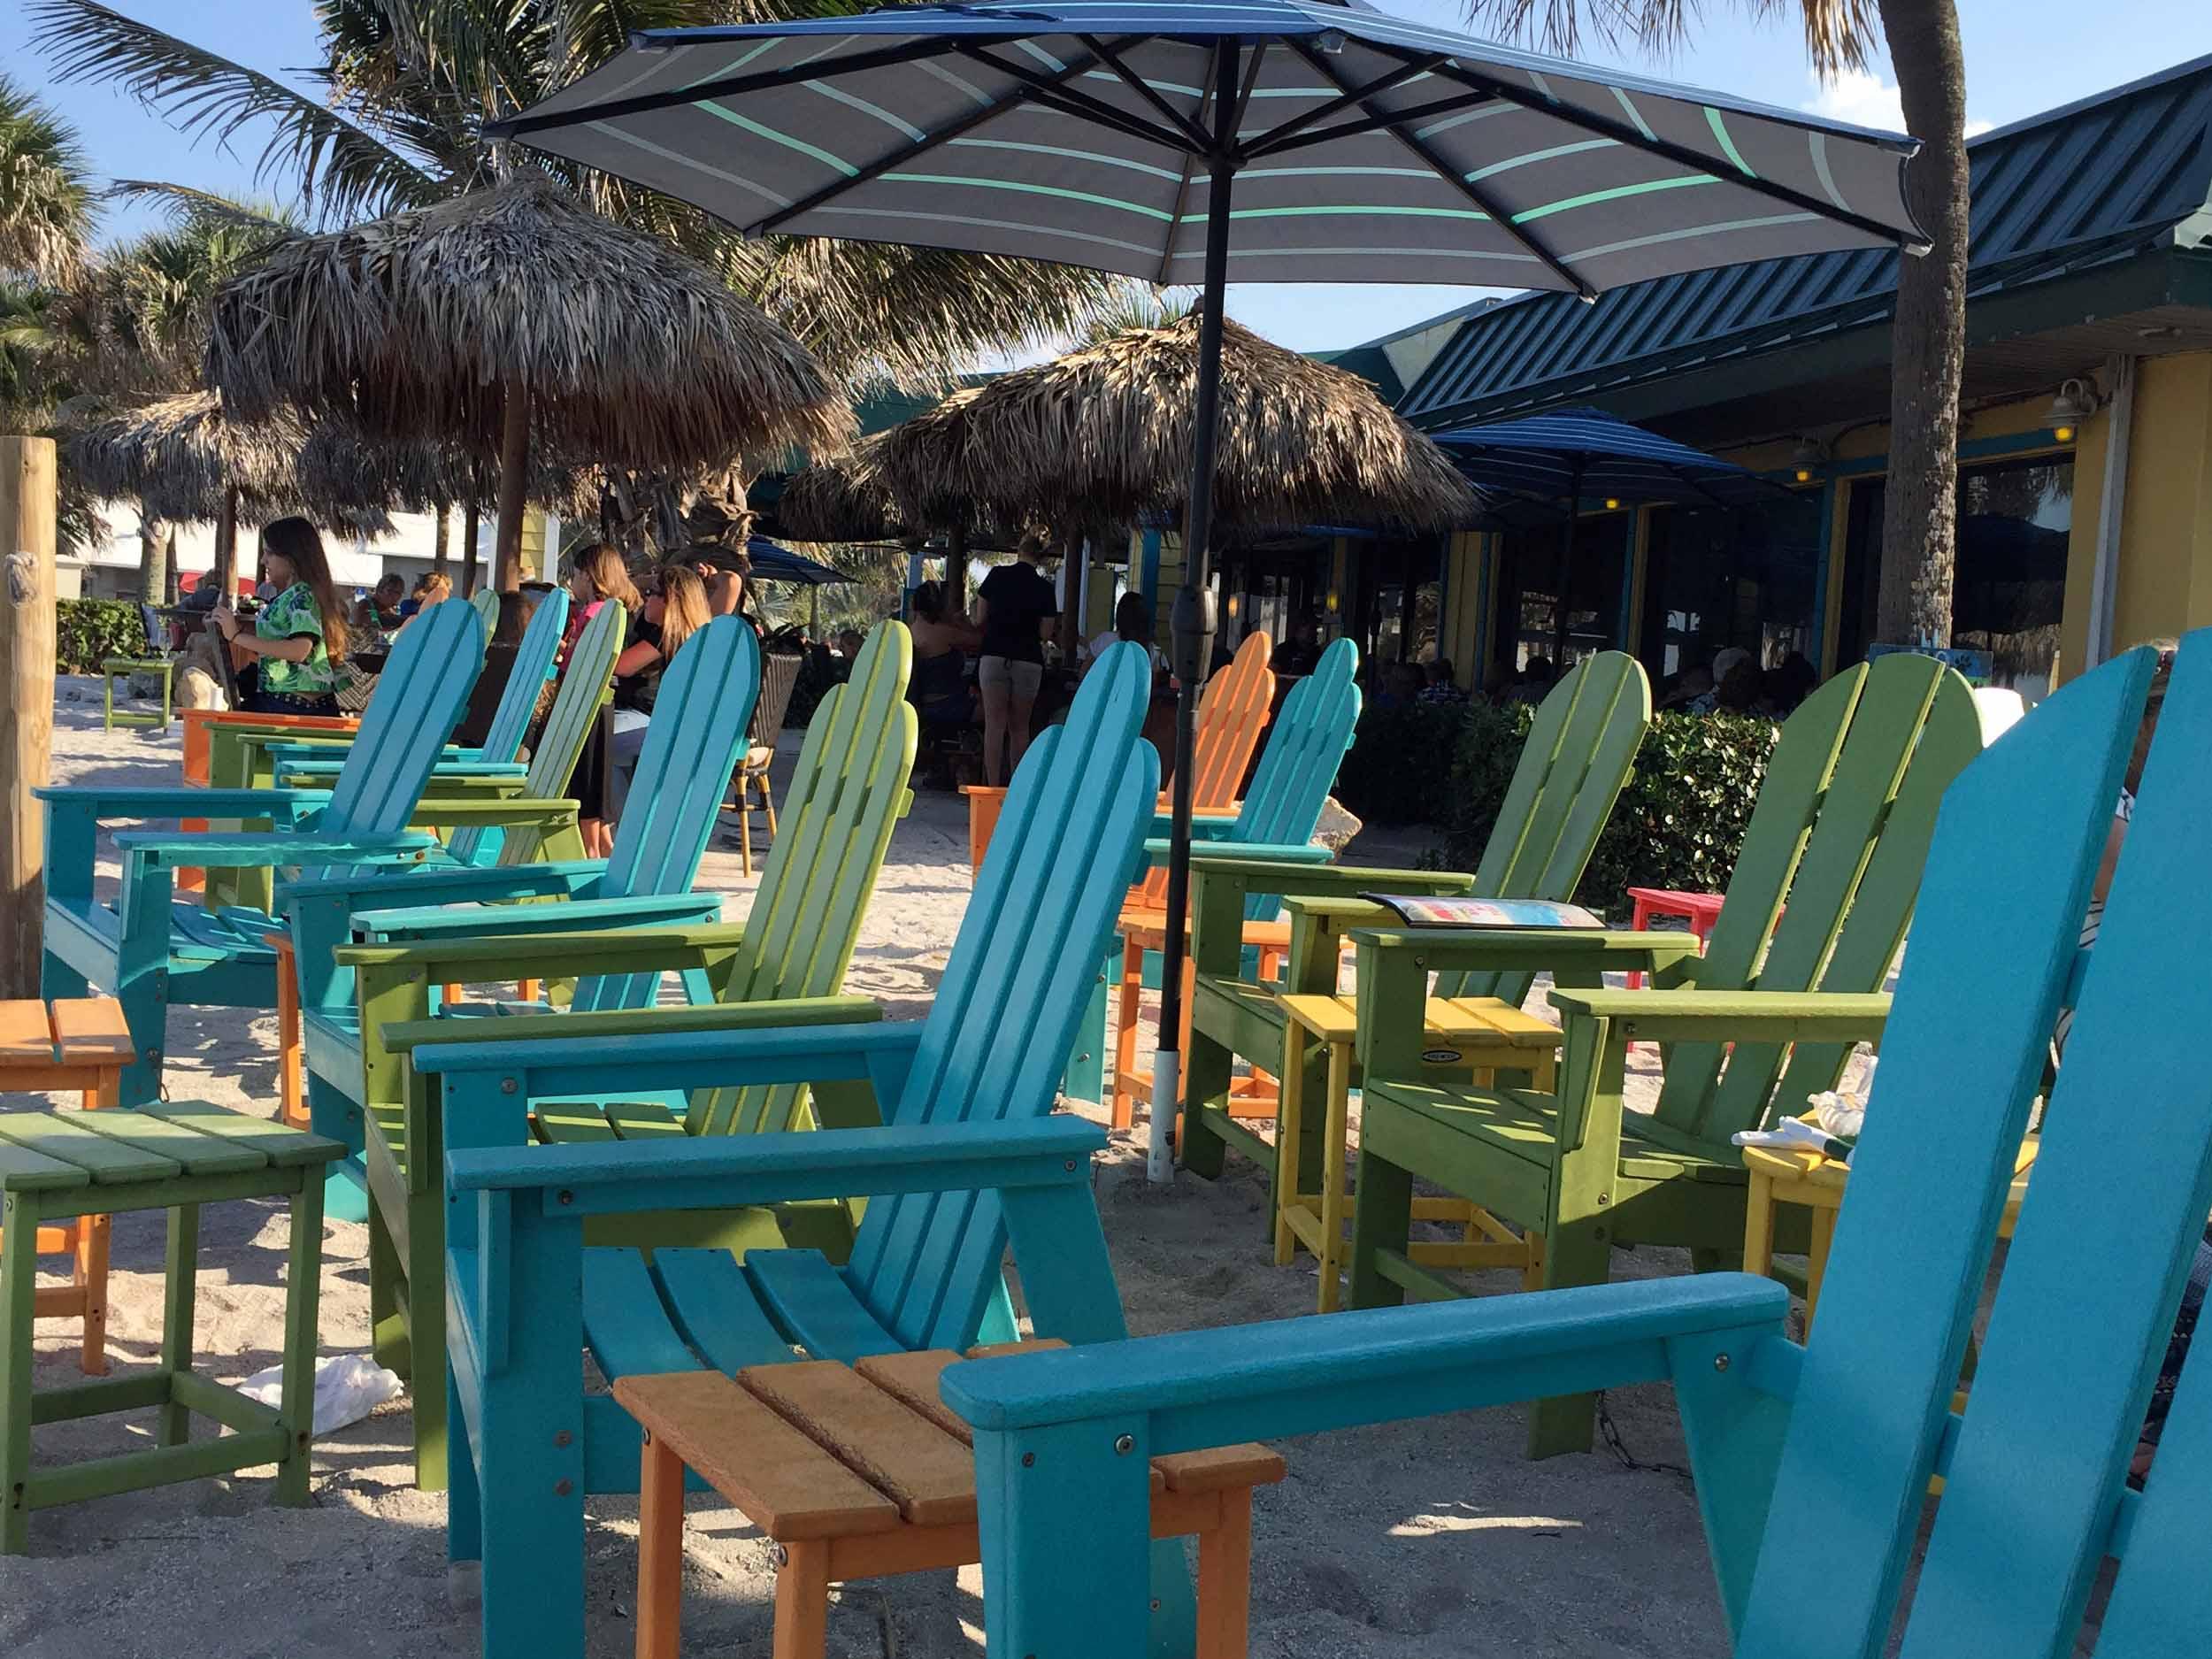 Mulligan's Beach House Bar and Grill Beach Chairs